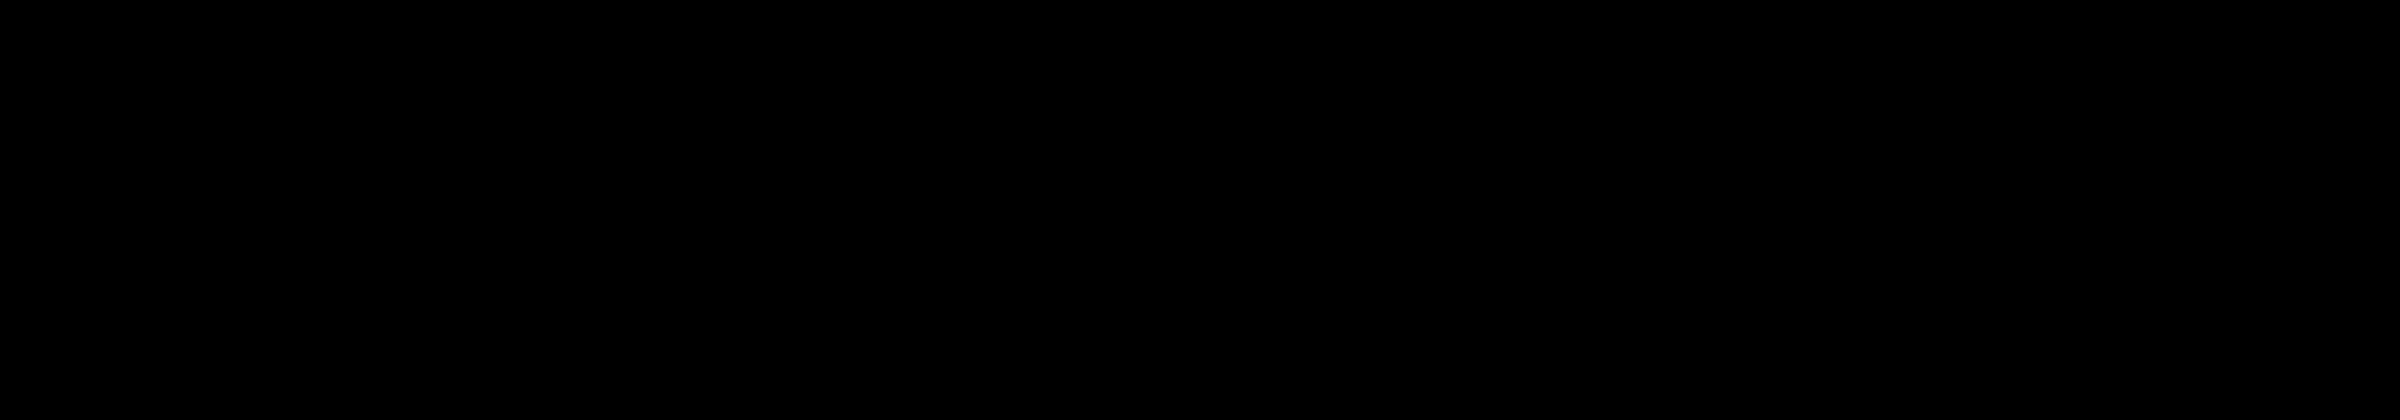 Rifle silhouette big image. Clipart gun musket